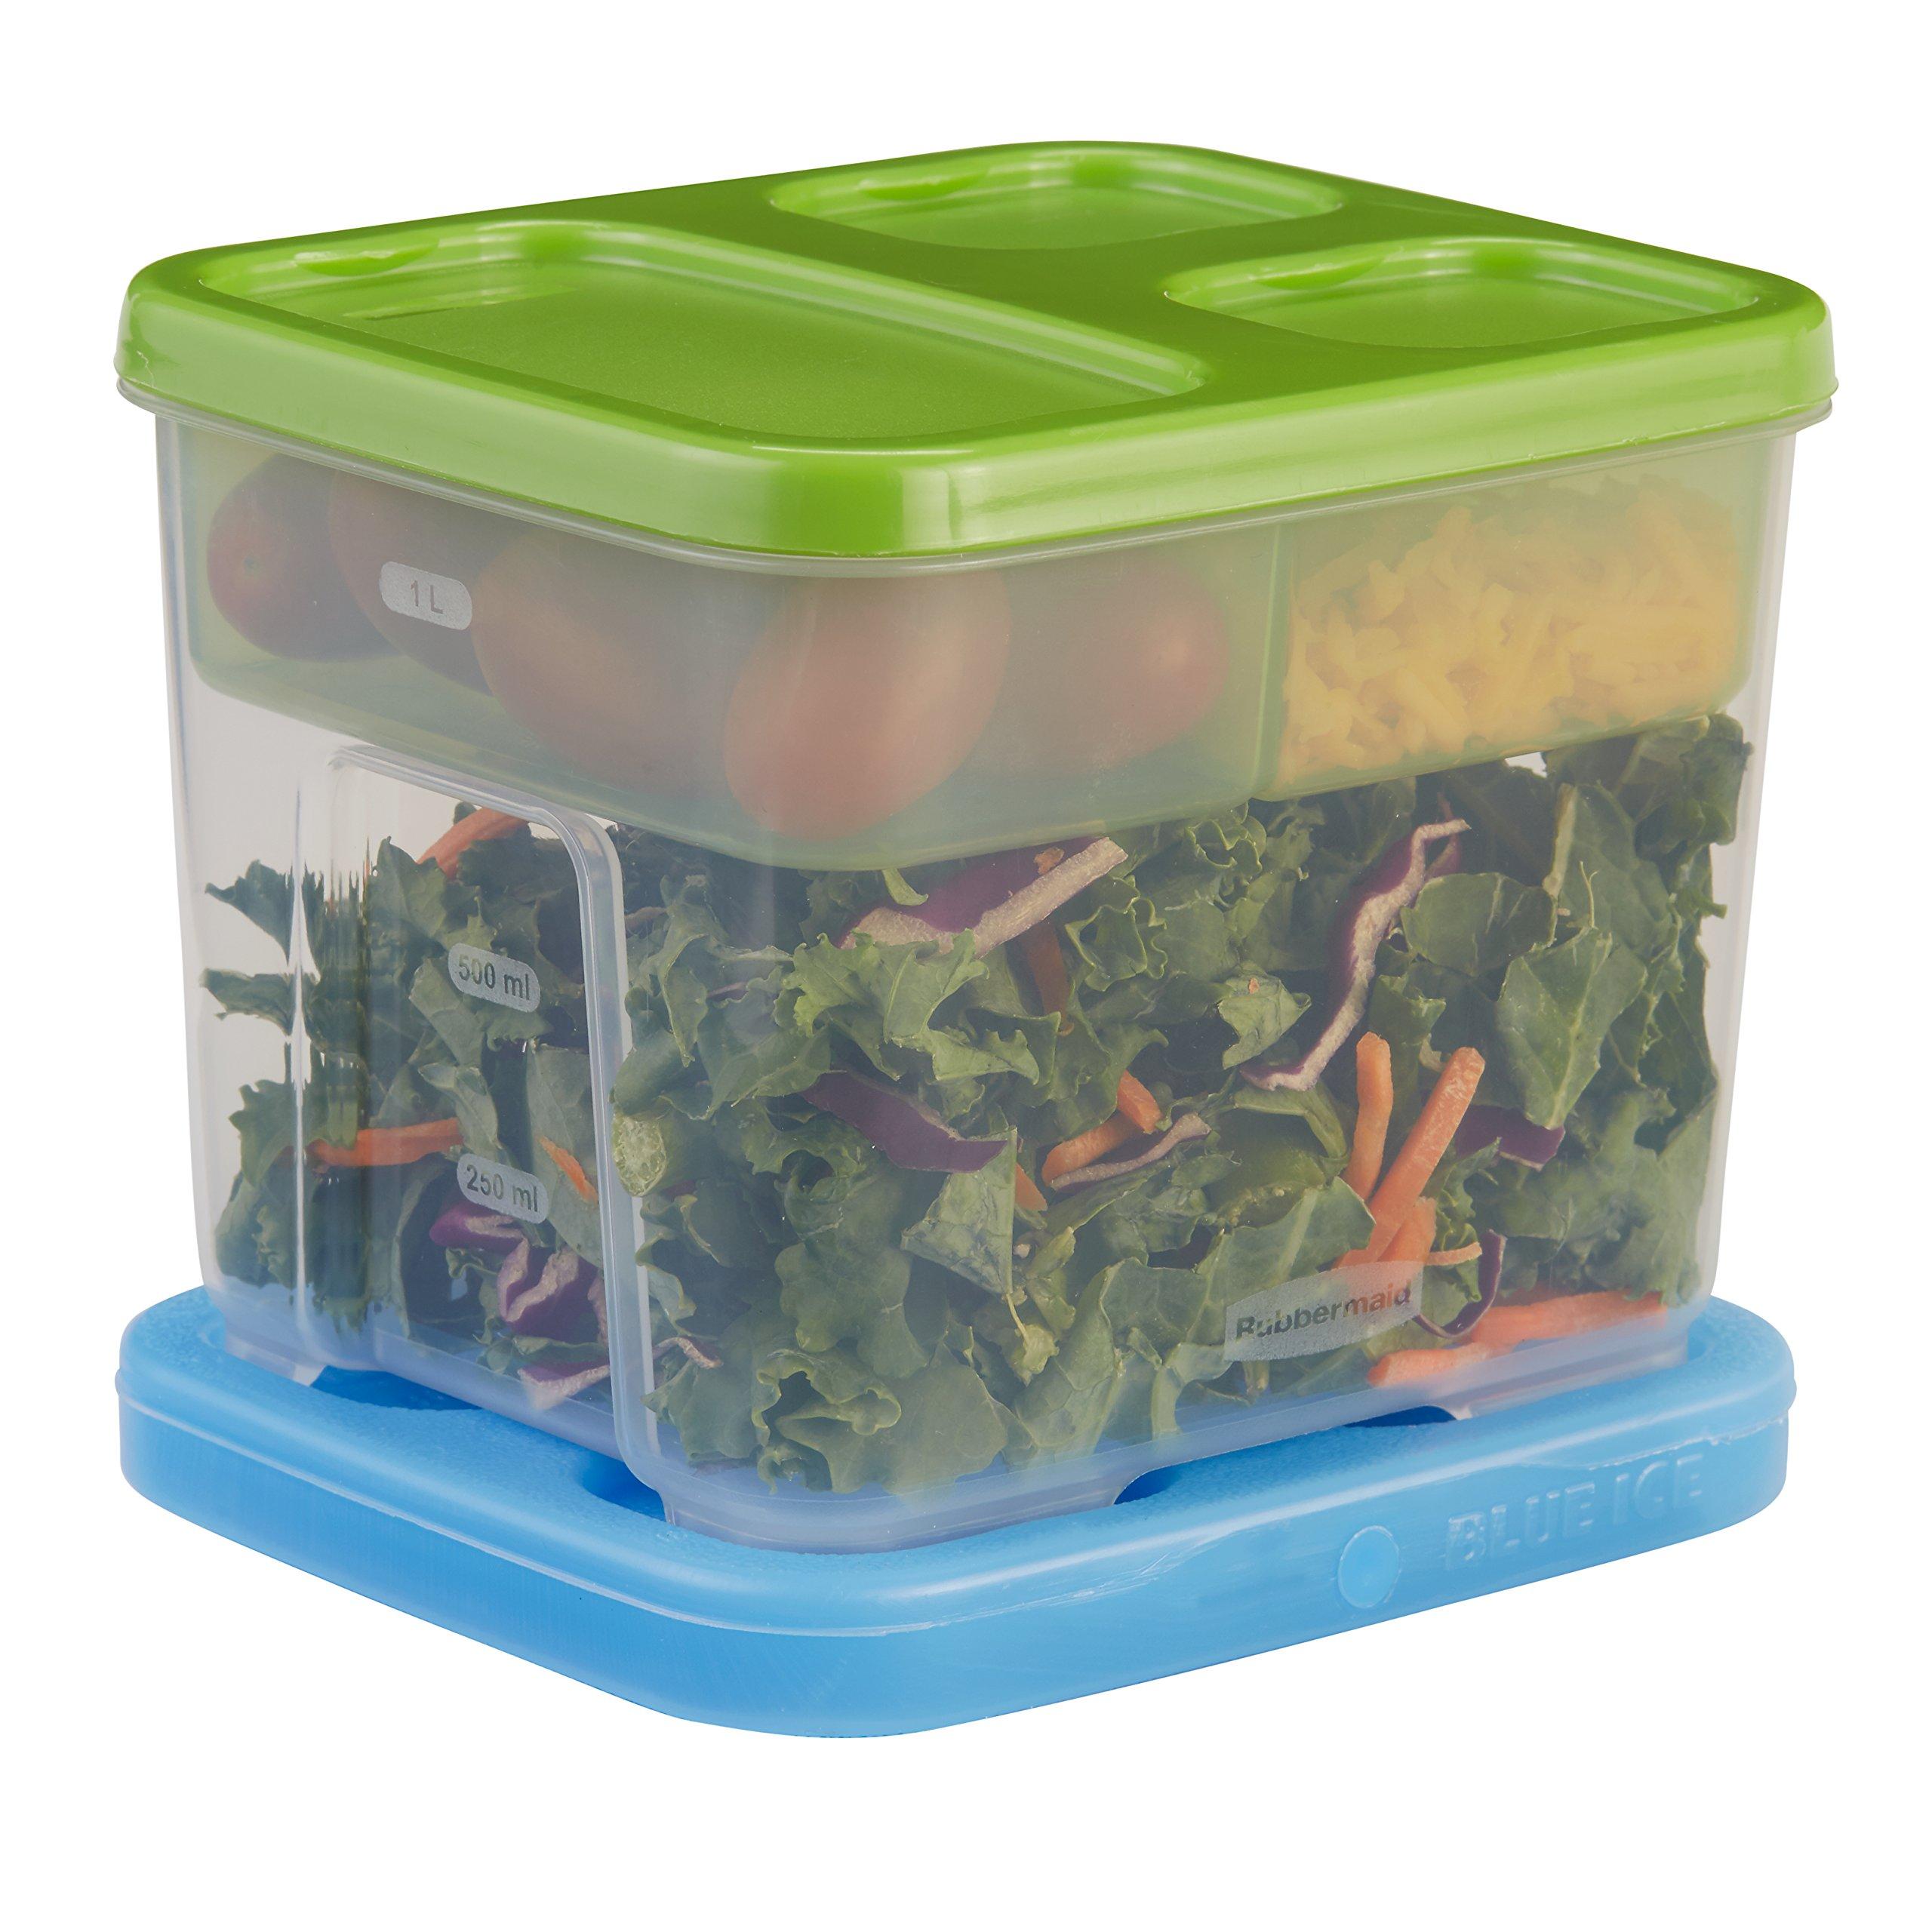 Rubbermaid LunchBlox Salad Kit 1806179